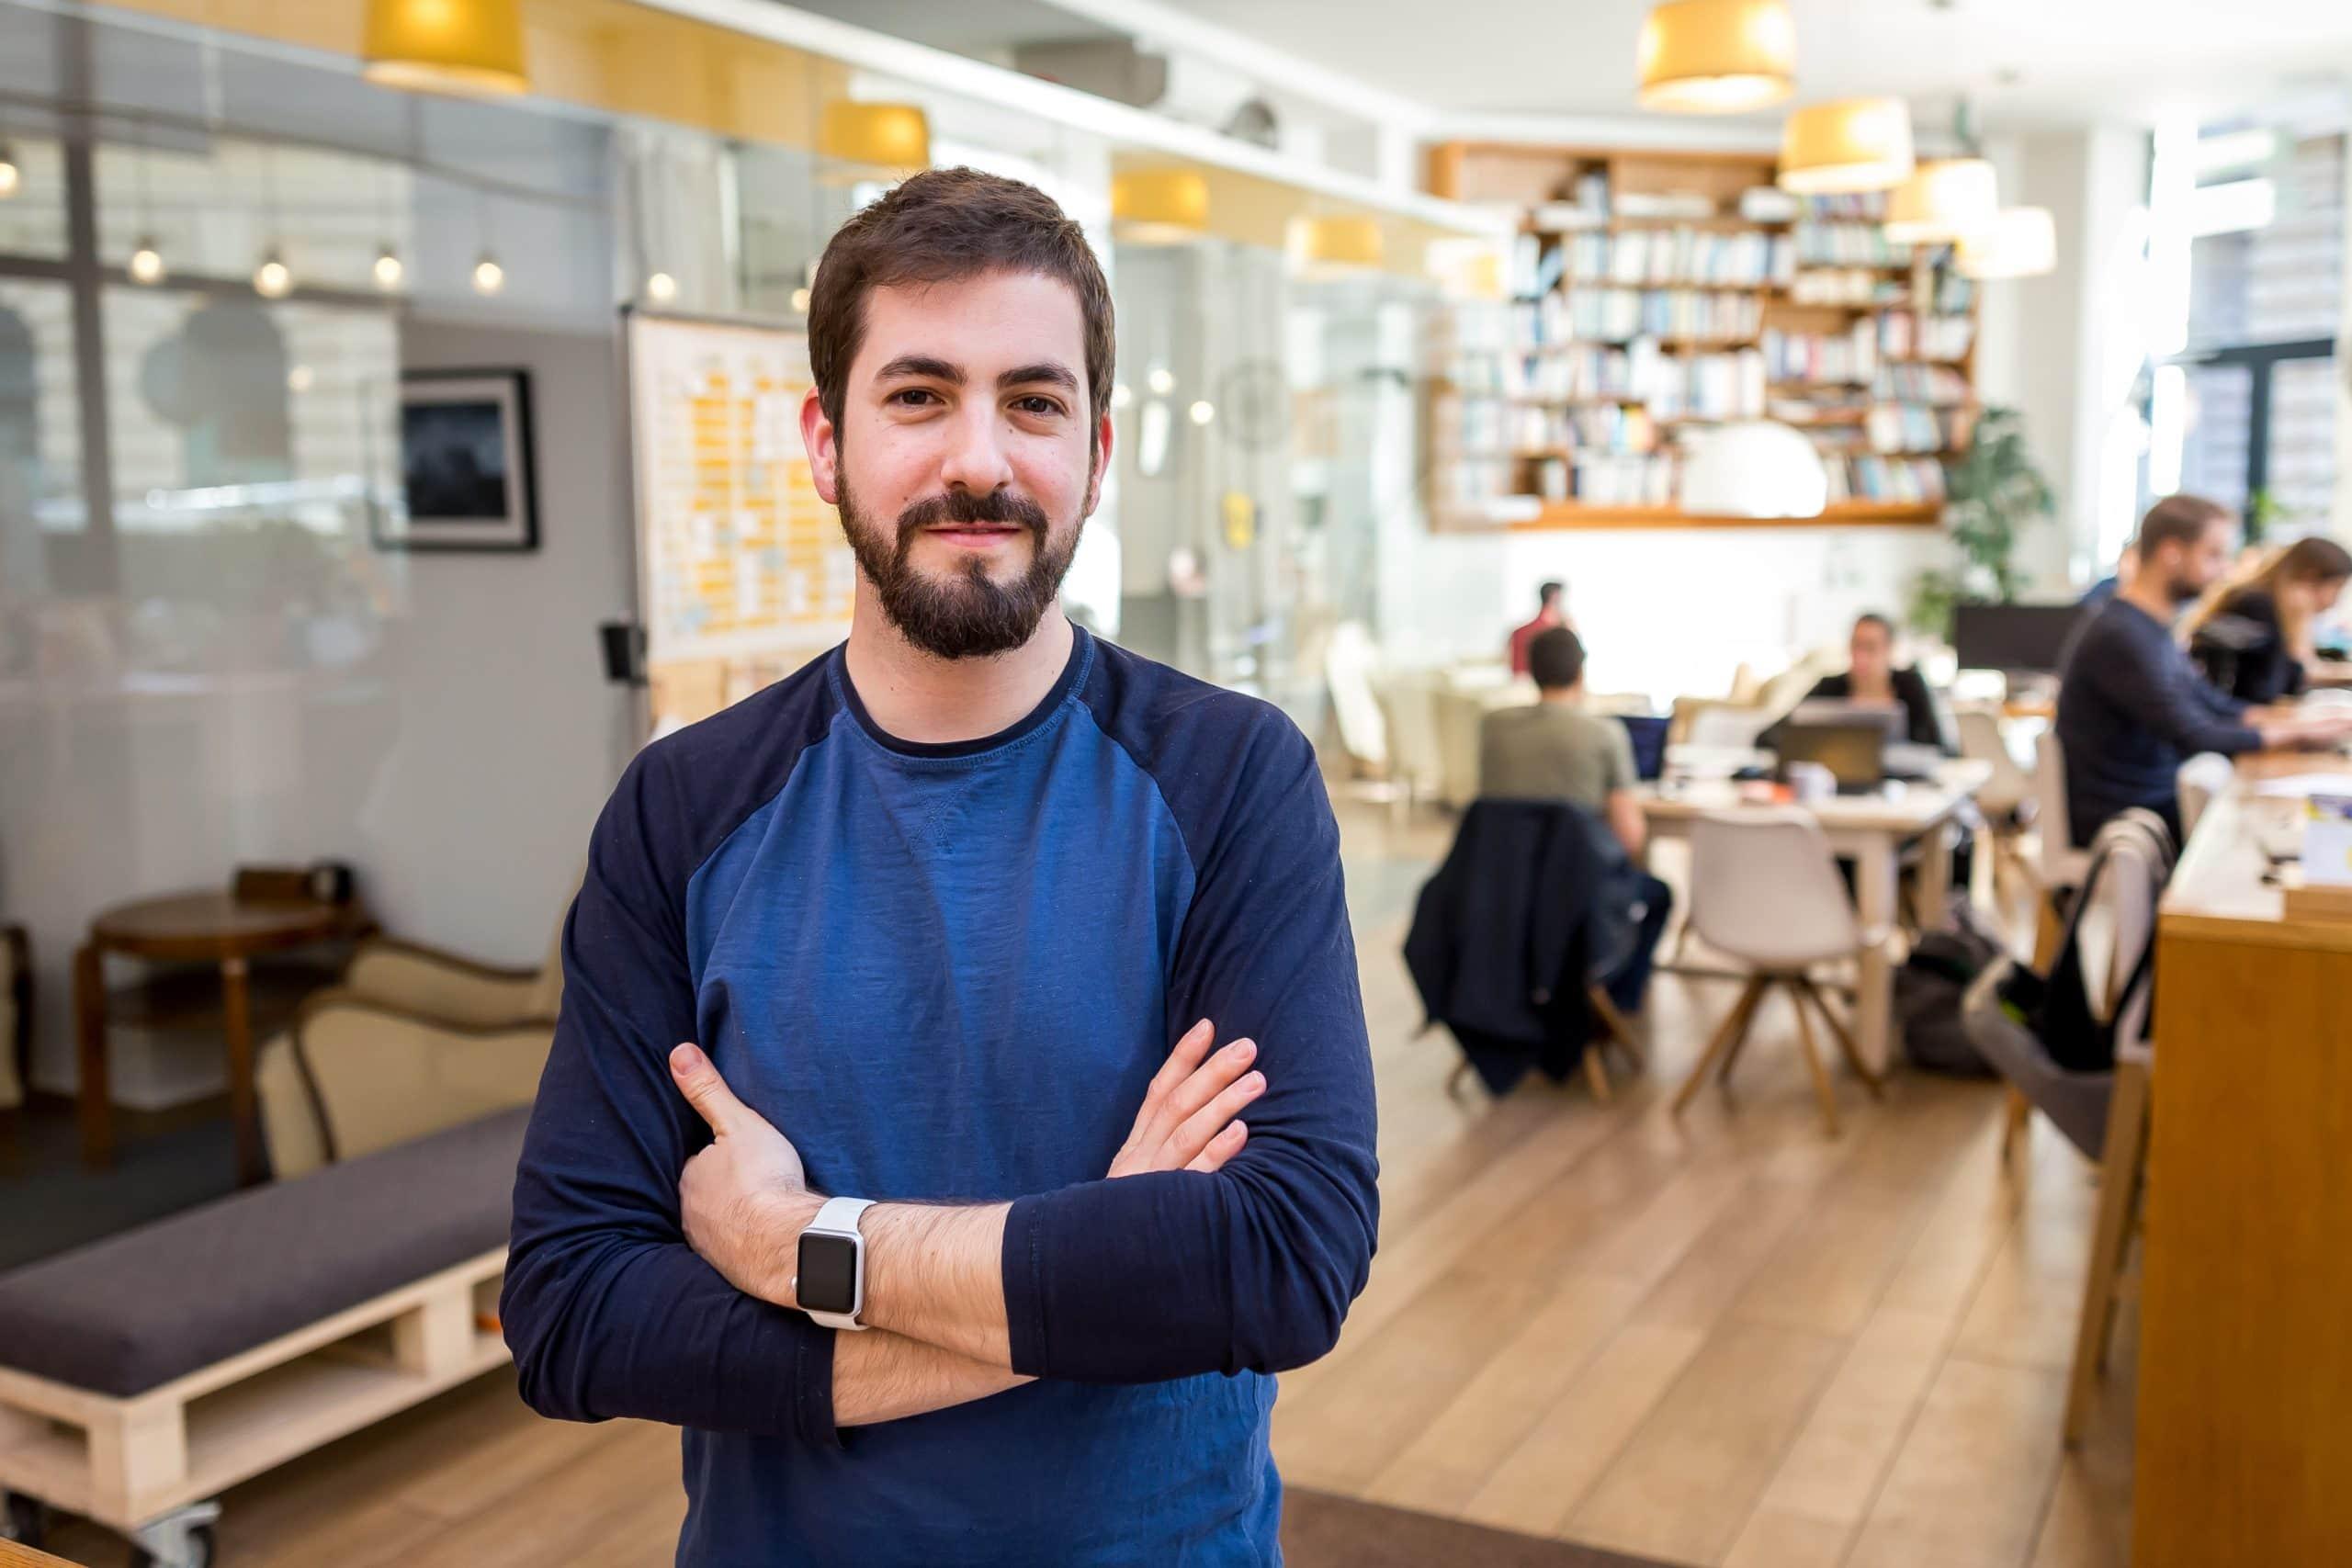 Levendel Áron - Kaptár alapító. KAPTÁR coworking Budapest